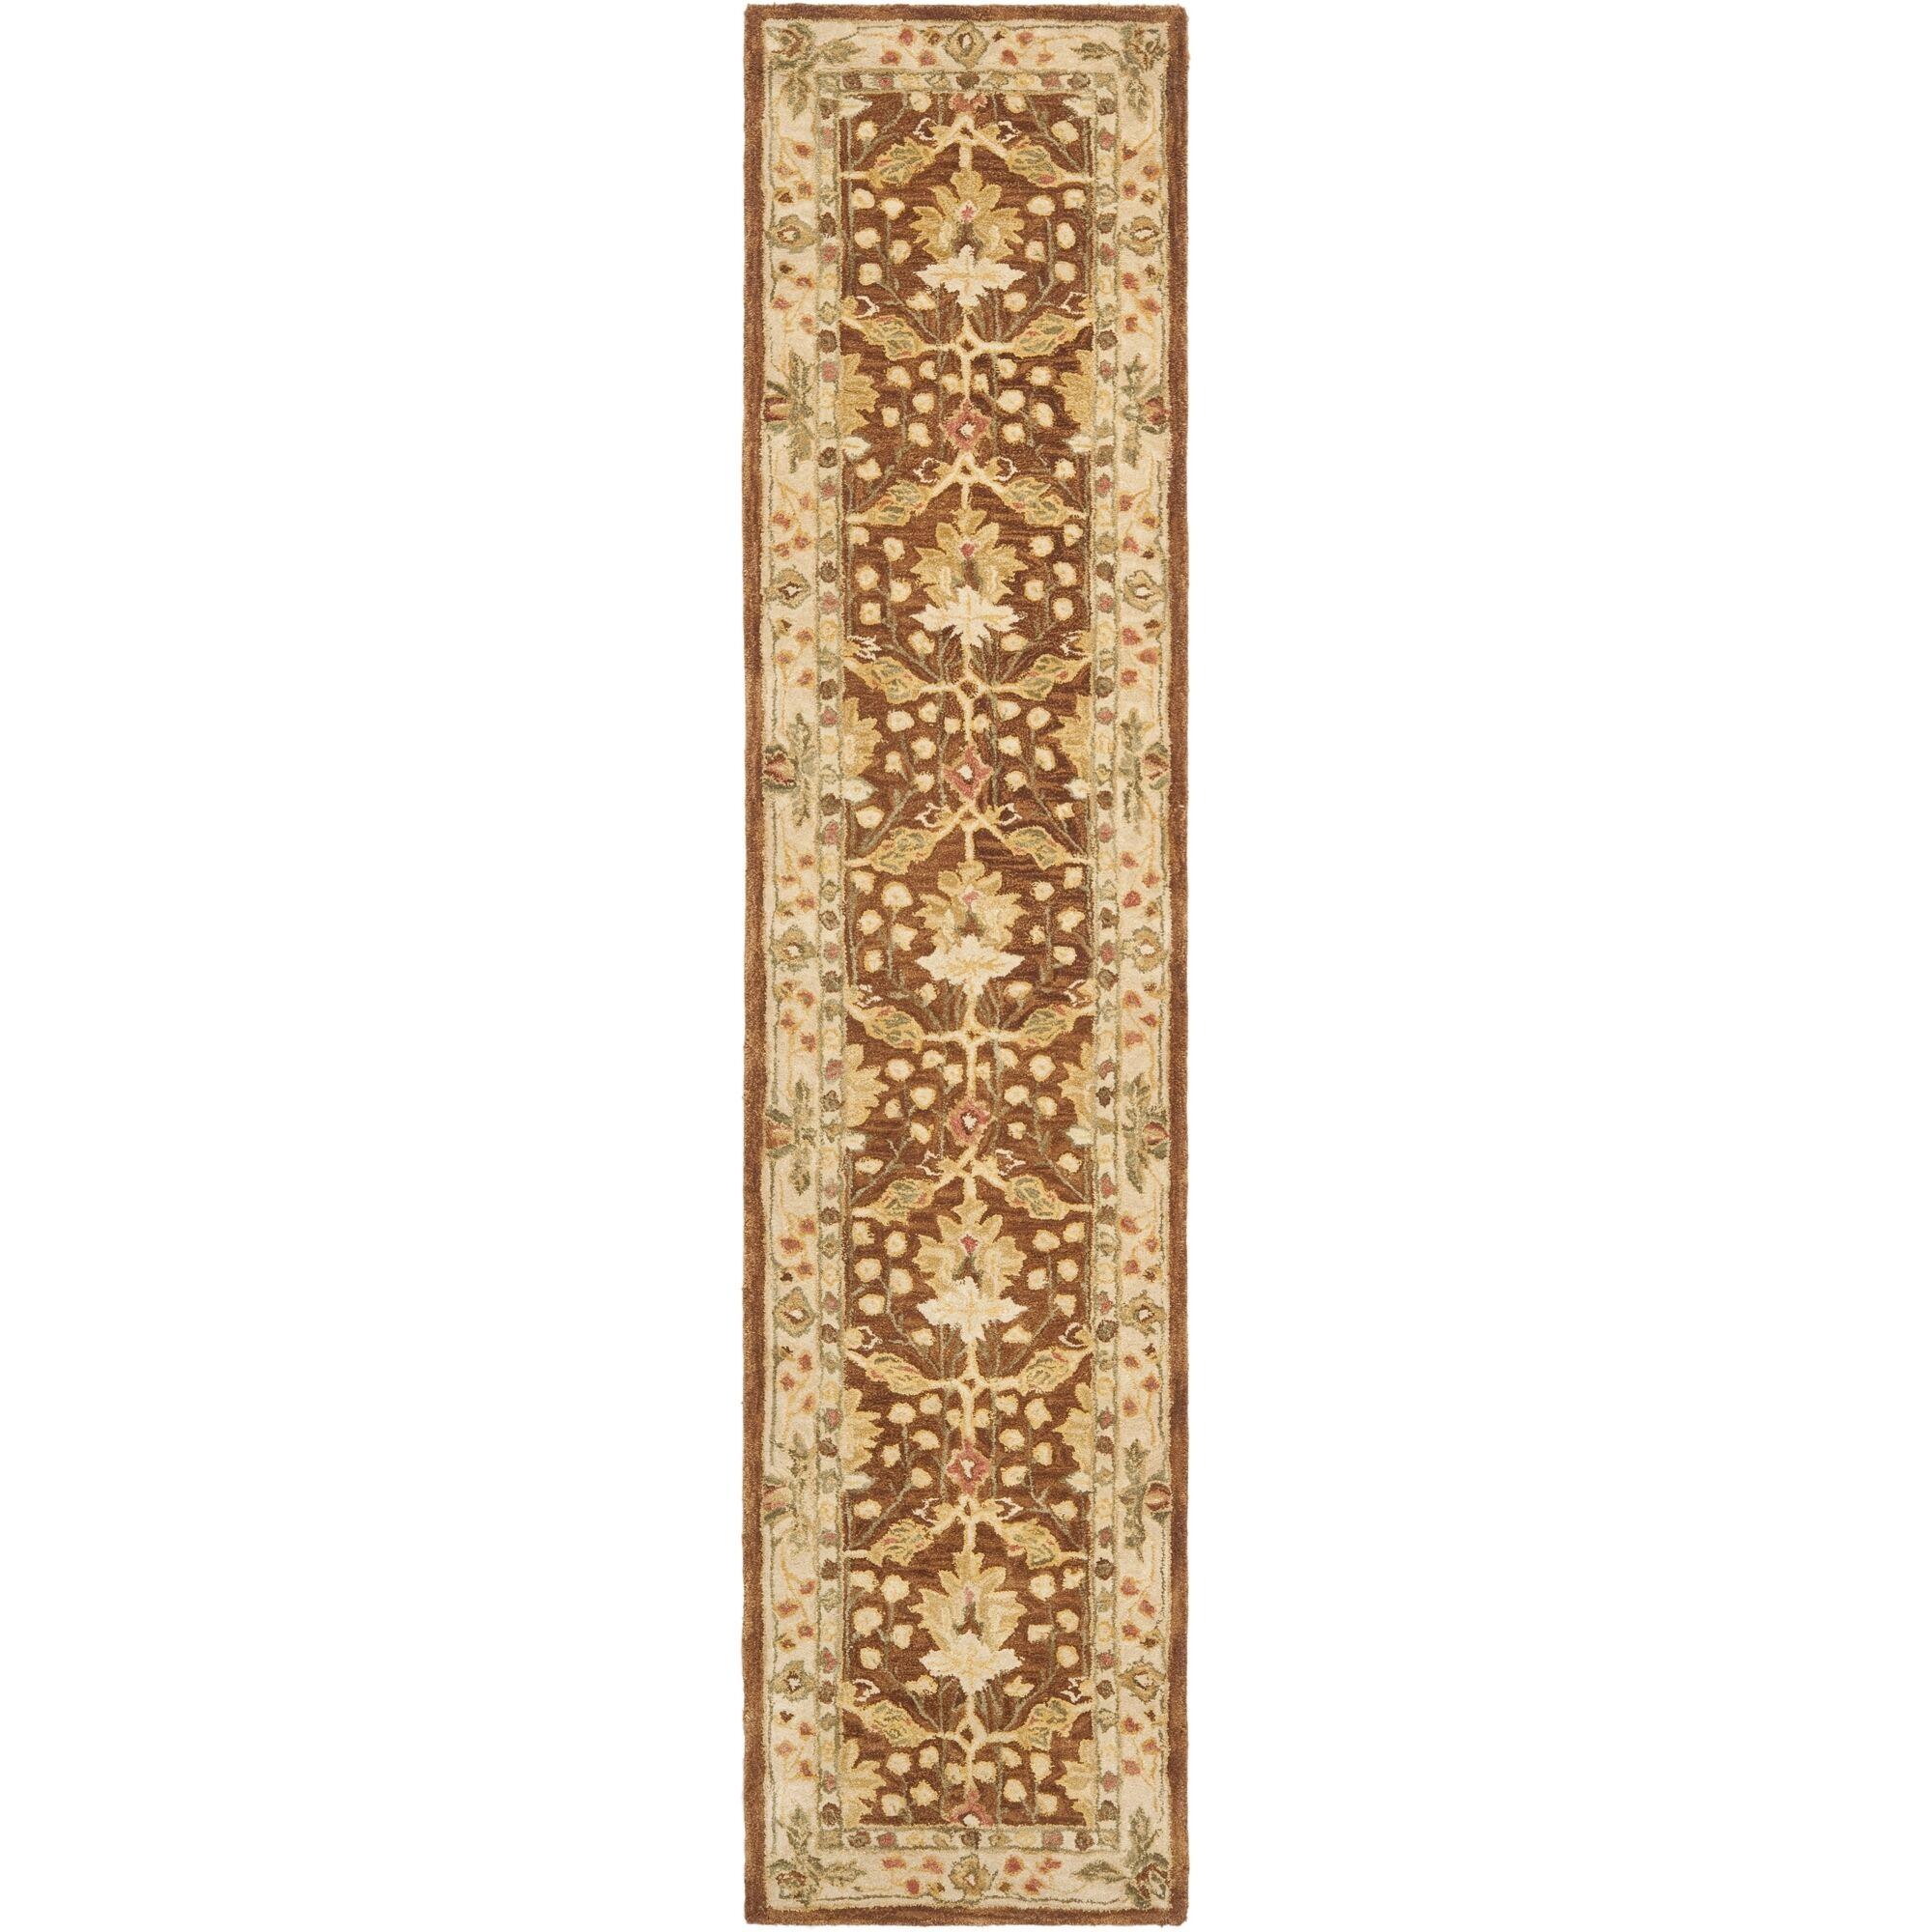 Anatolia Hand-Woven Wool Brown/Cream Area Rug Rug Size: Runner 2'3